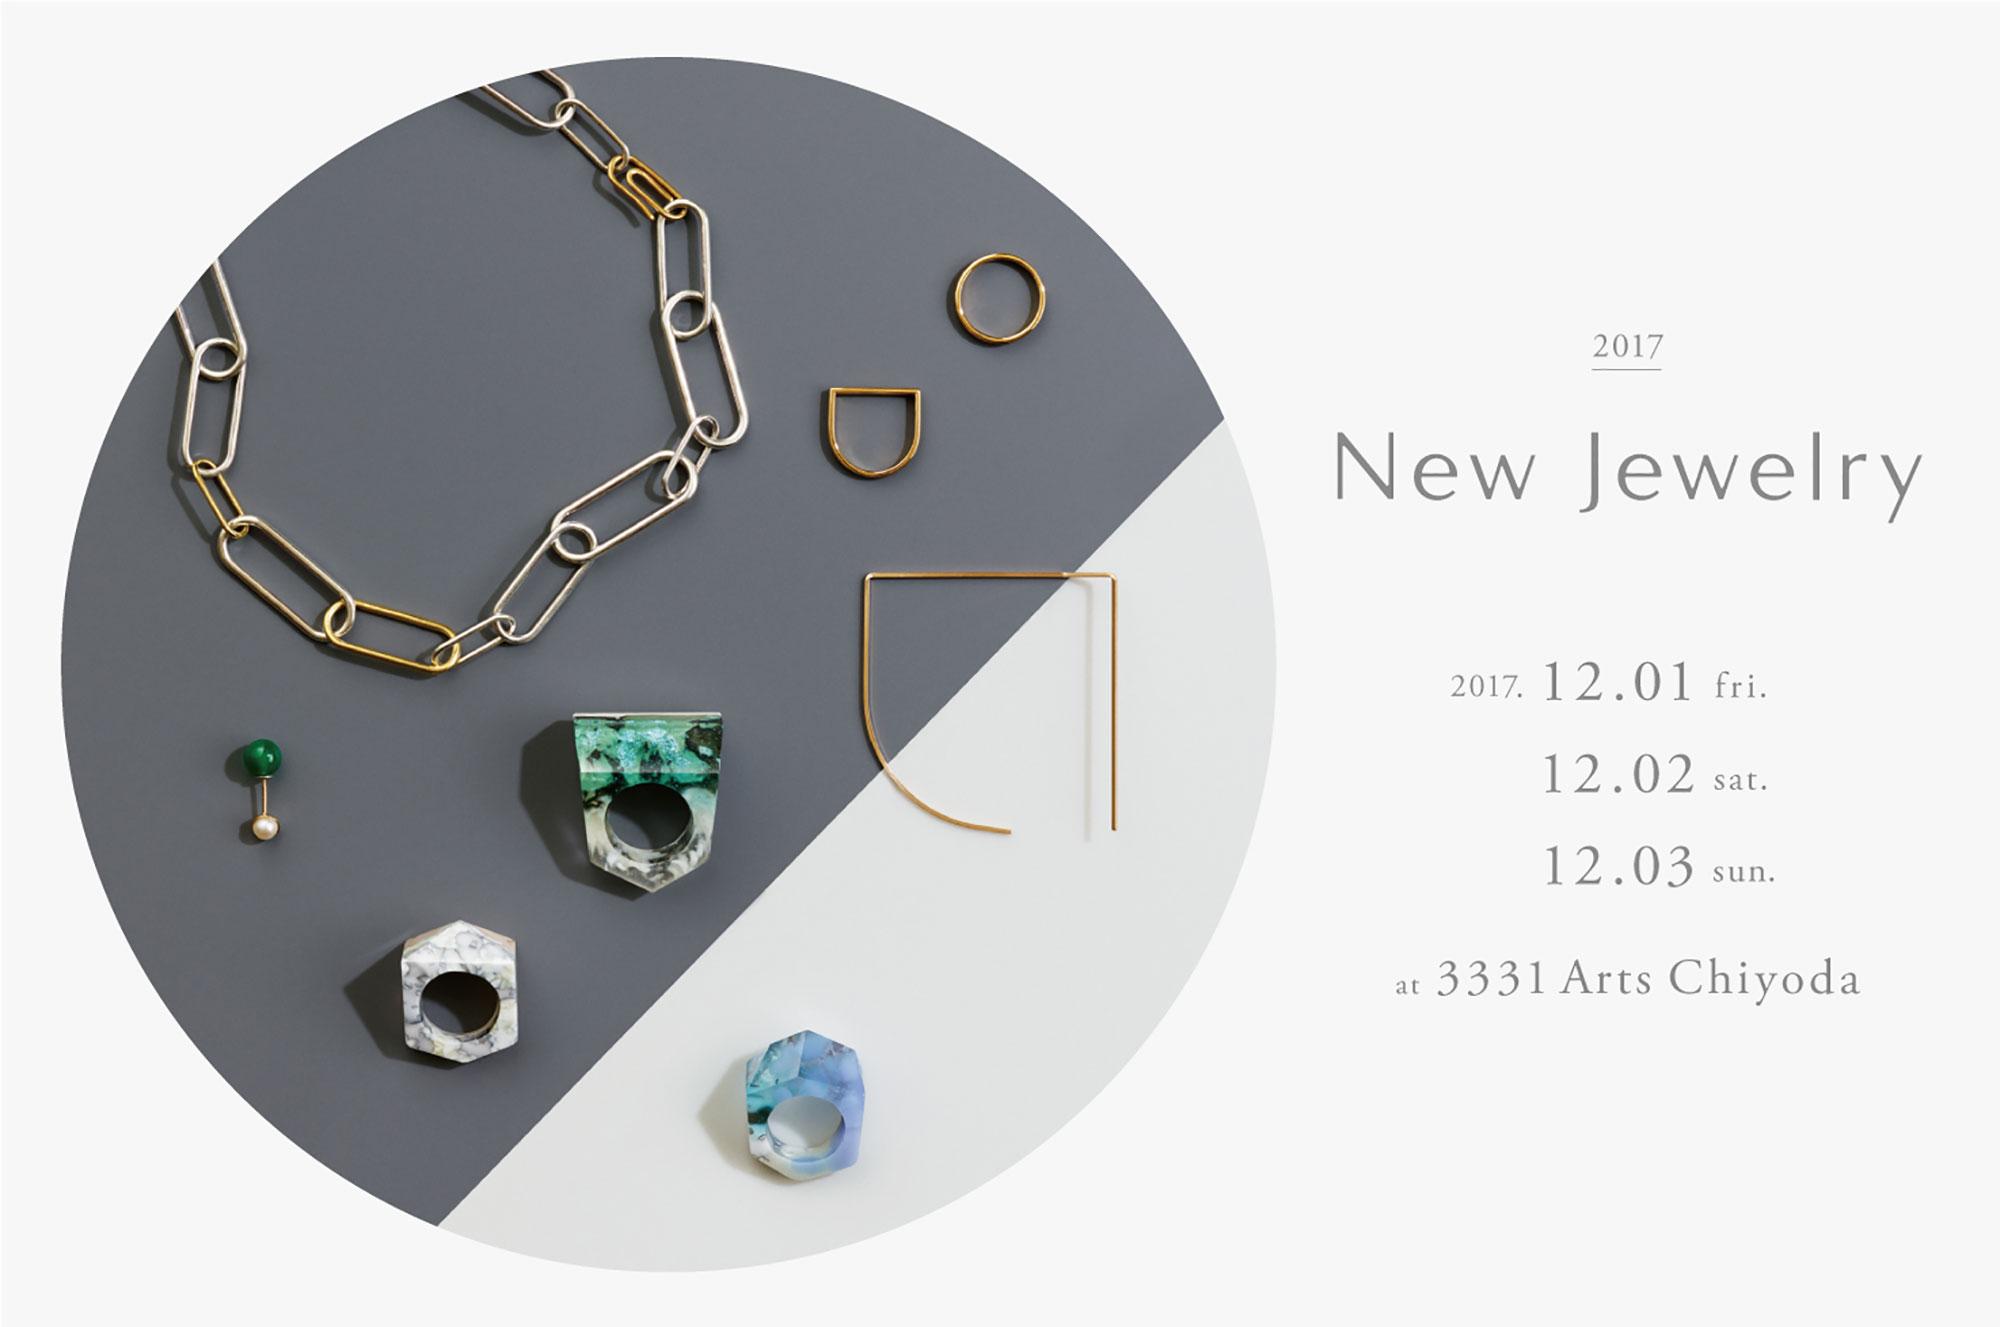 New Jewelry 2017